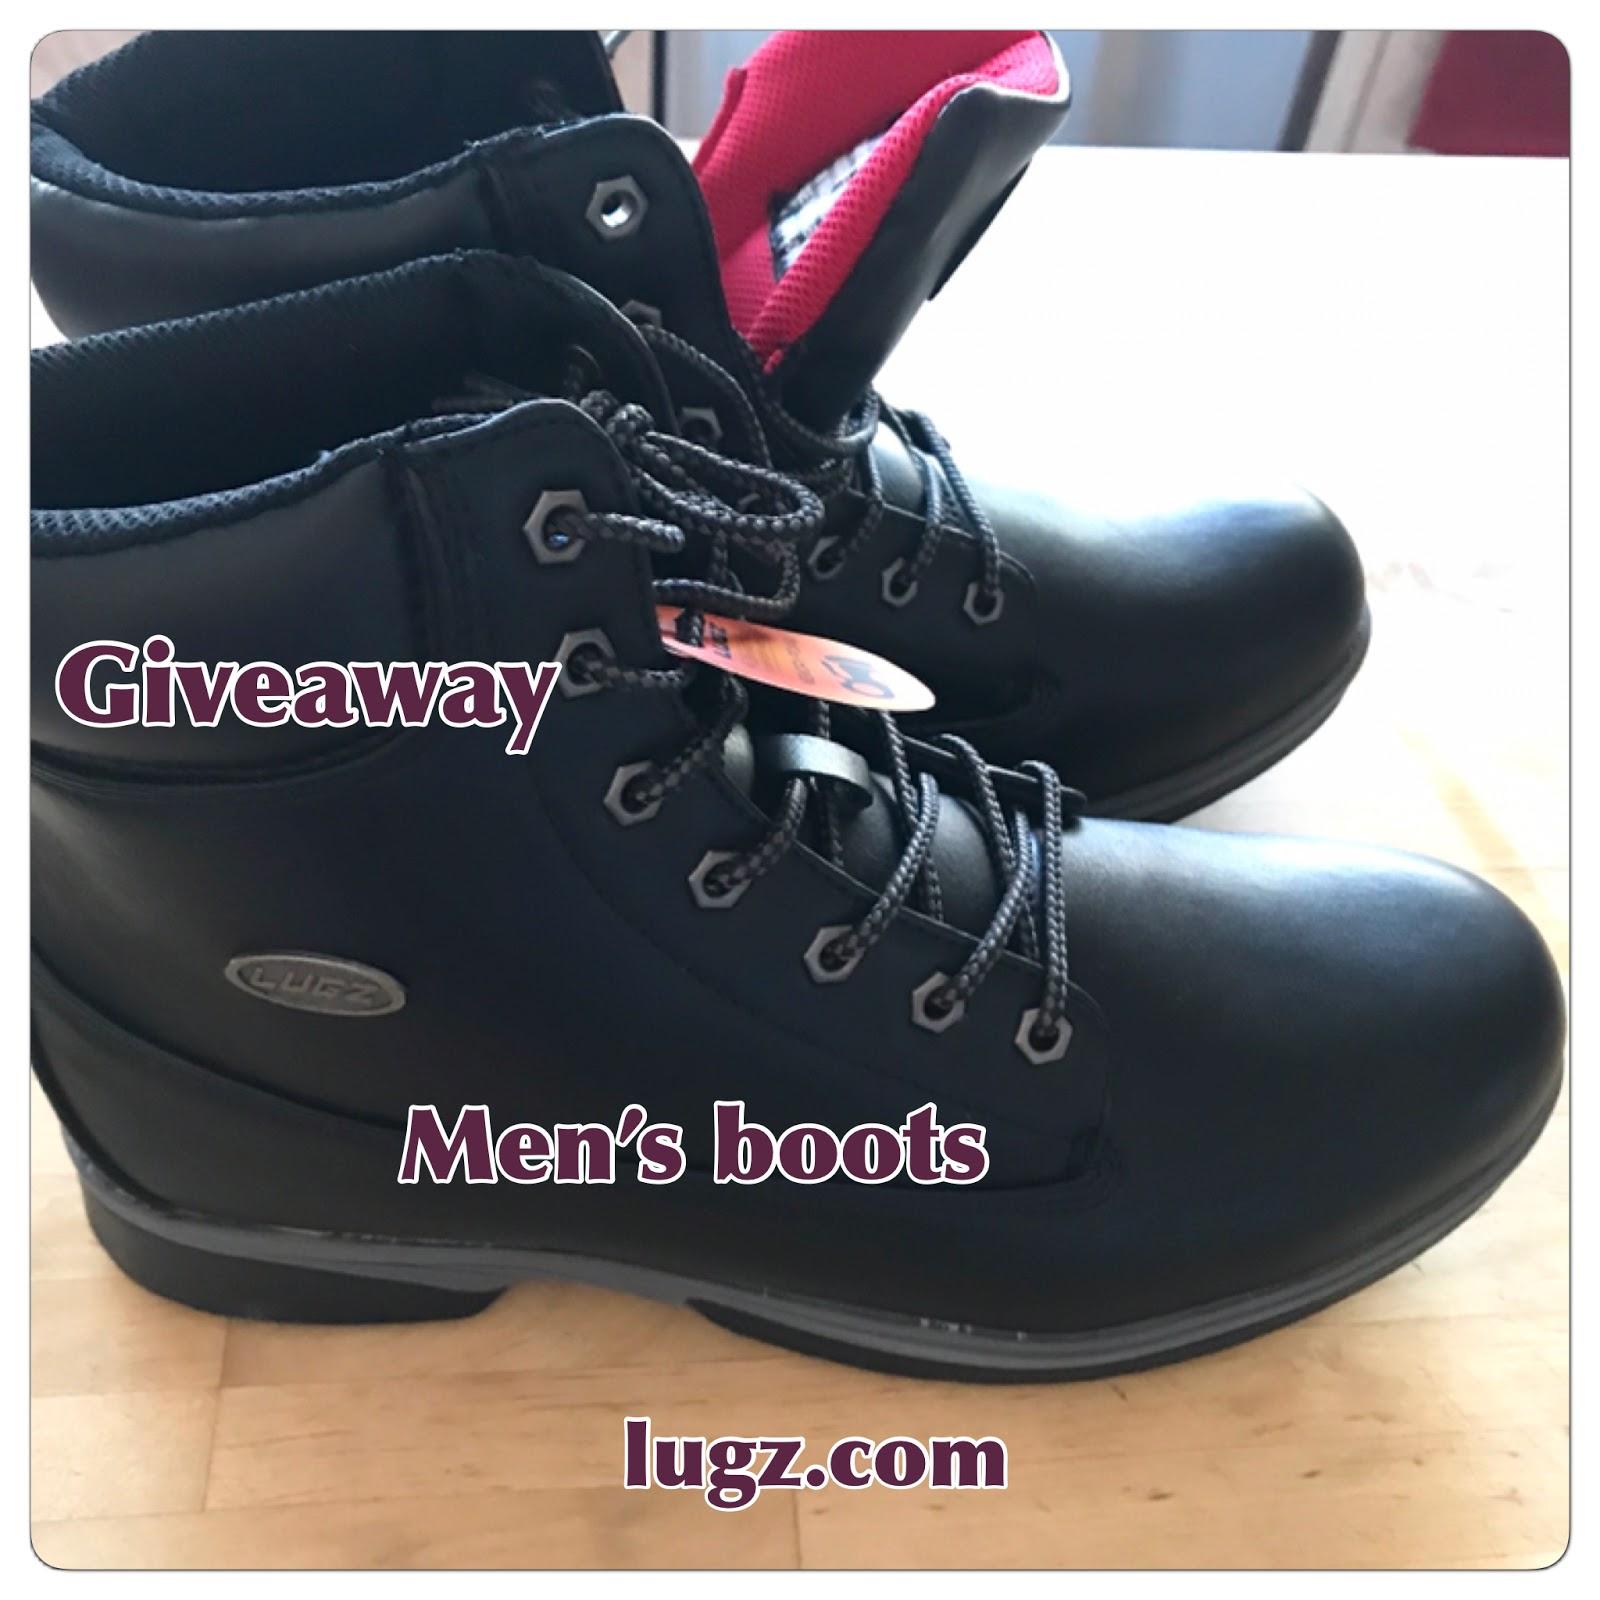 ff9199d2a Razzle Dazzle Styles: Reviews! GiveAways! Promo! Fashion Blogger ...